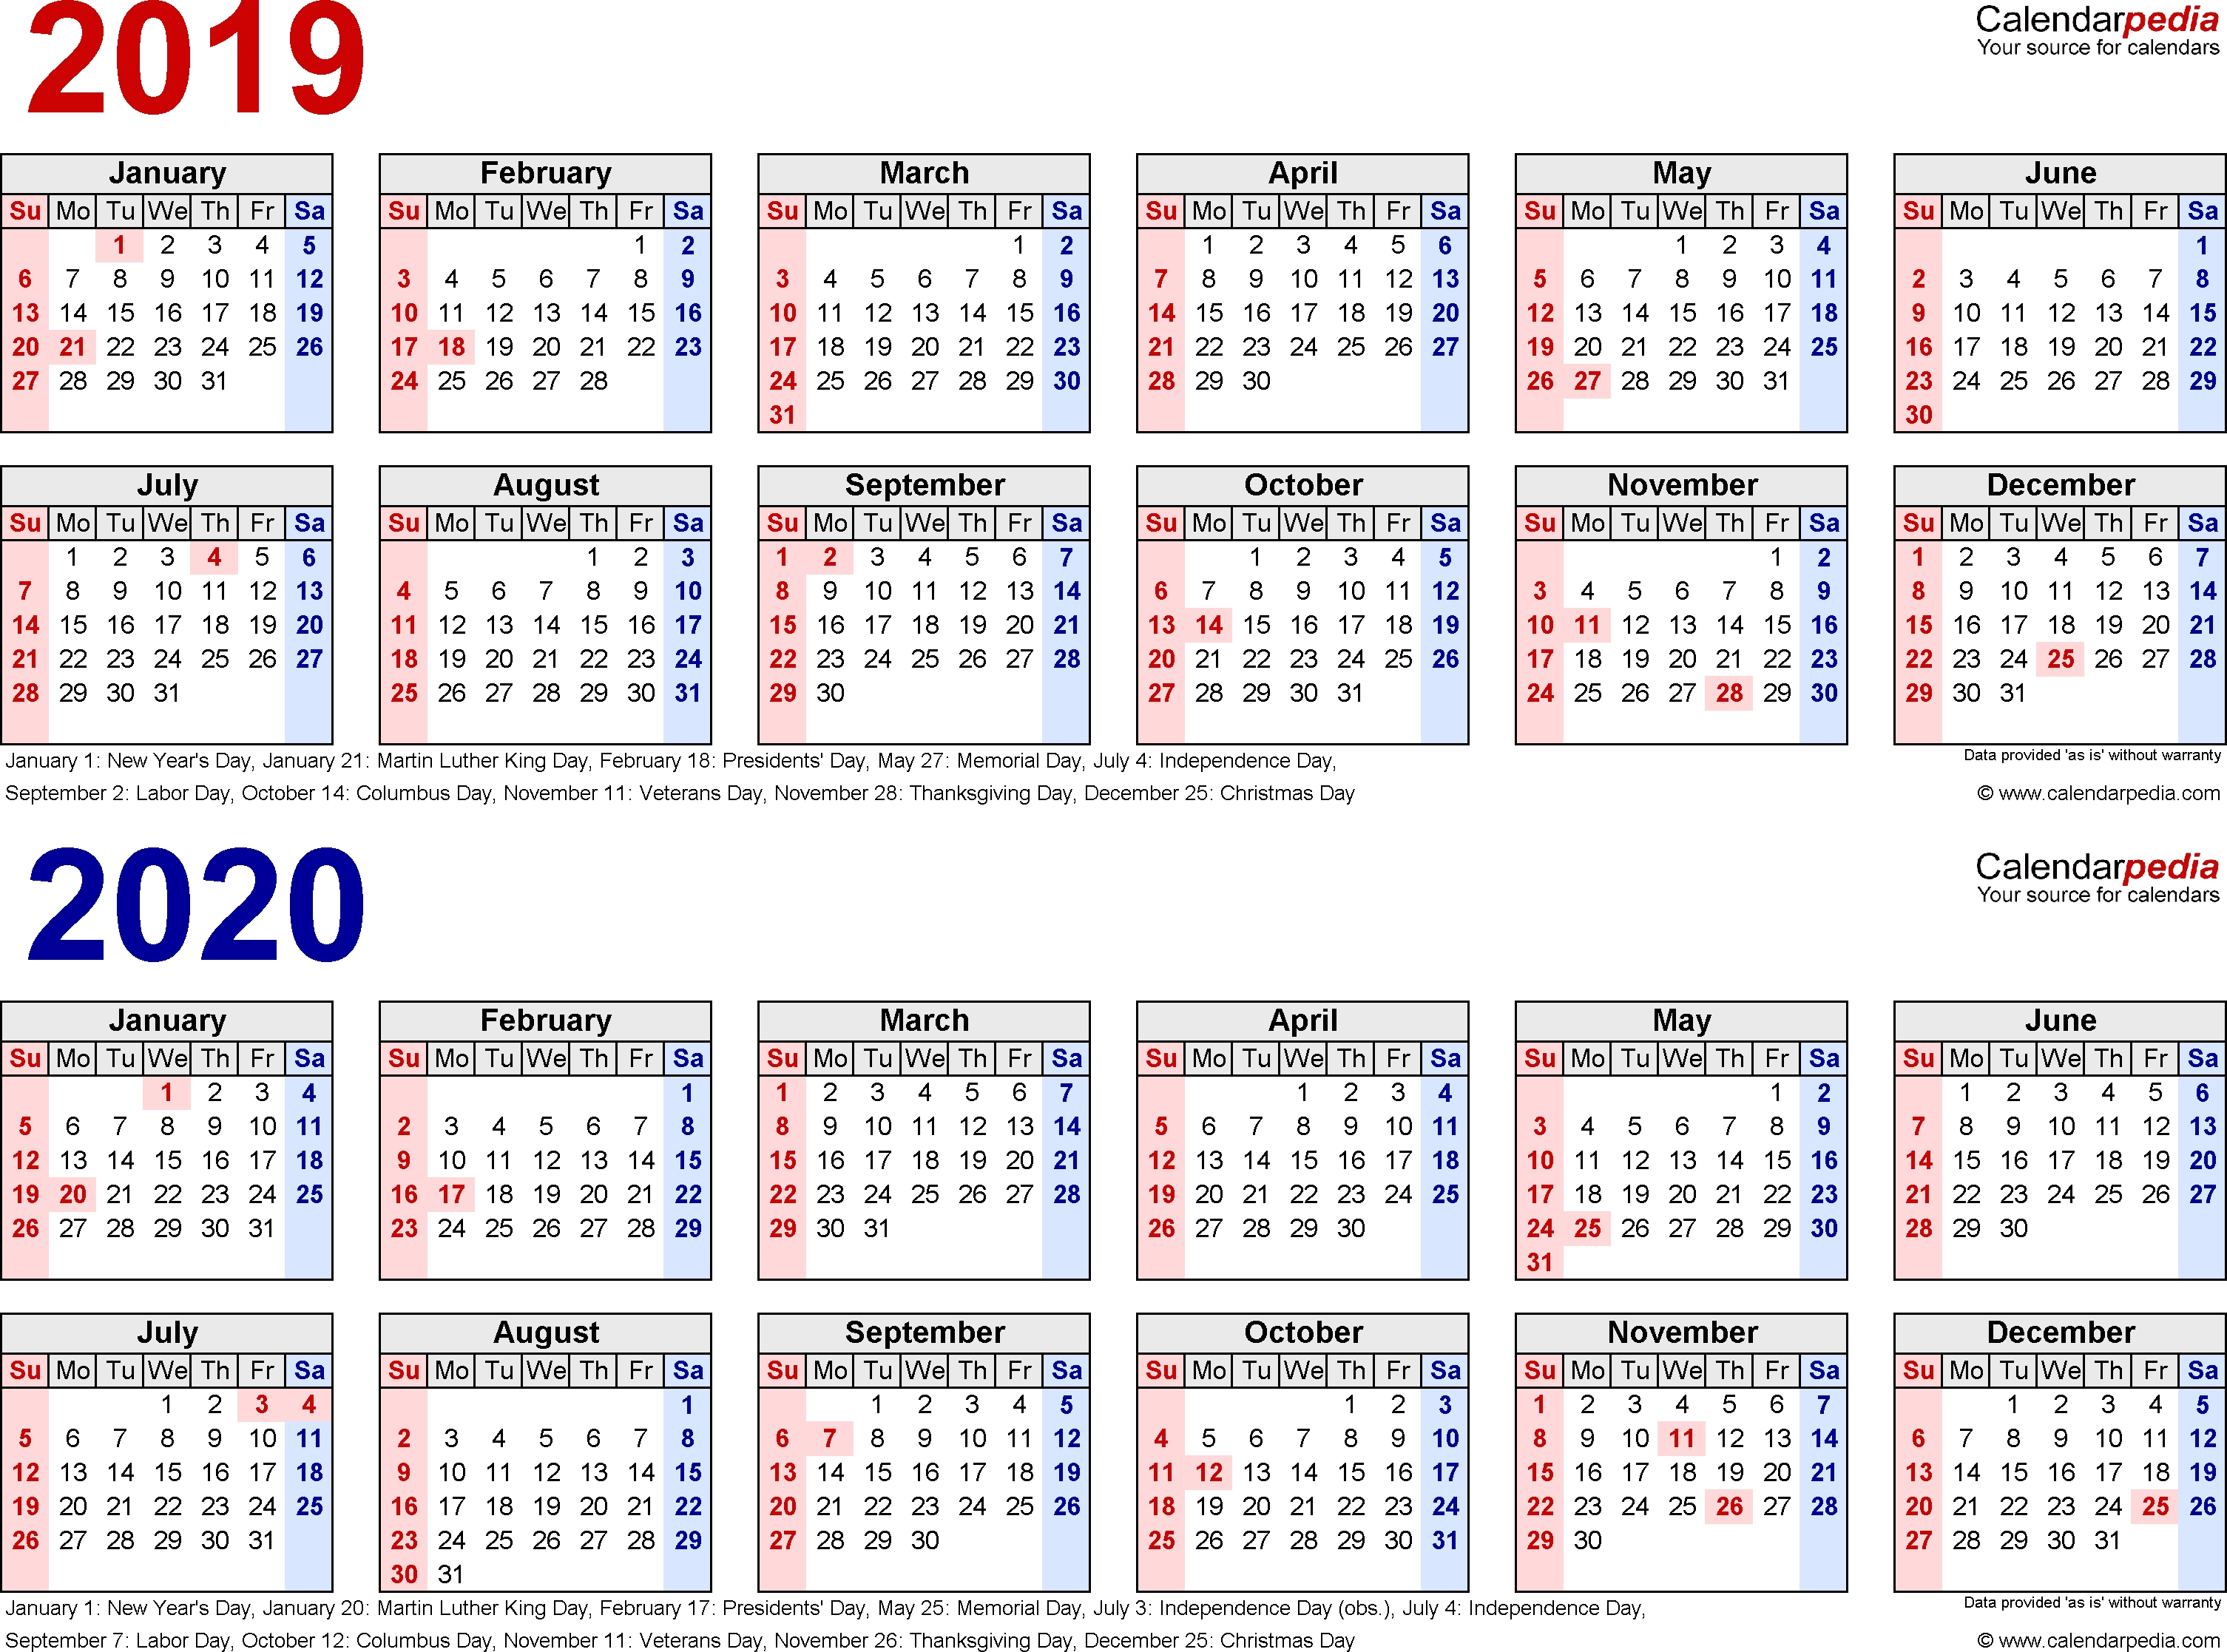 2019-2020 Calendar - Free Printable Two-Year Word Calendars in Downloadable 2019-2020 Calendar In Word